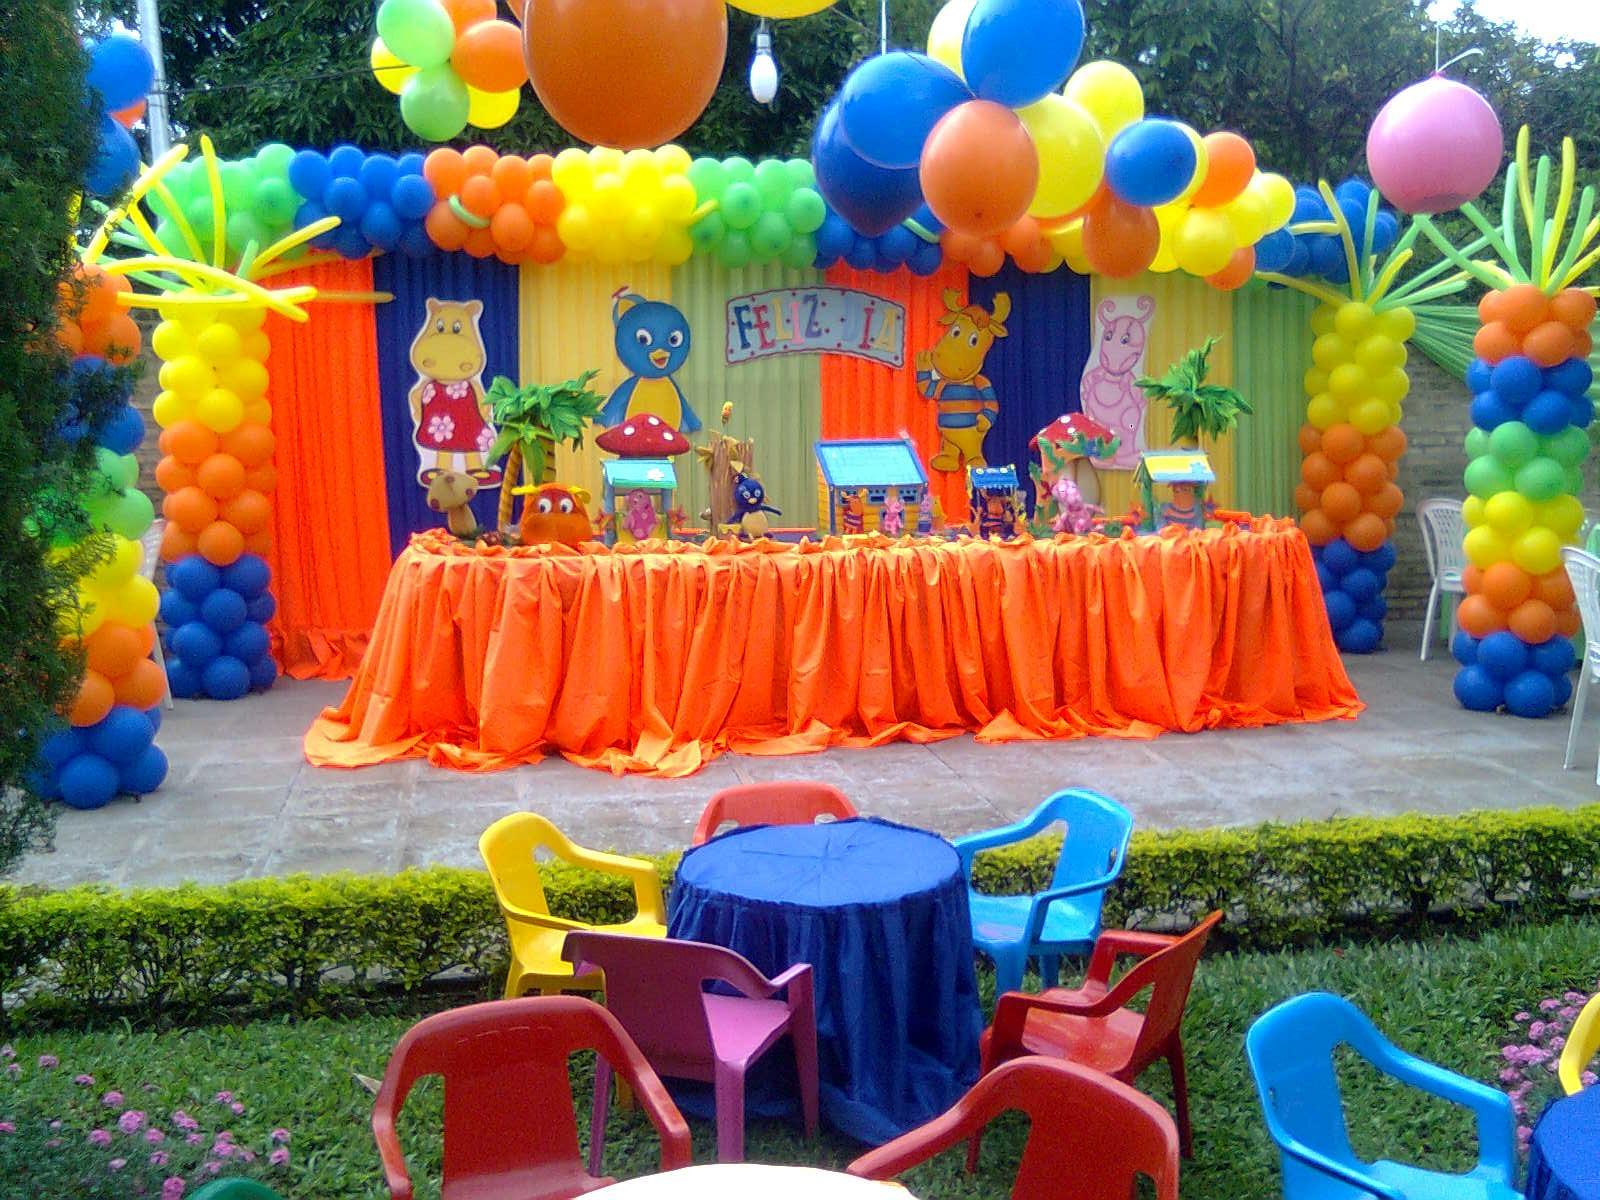 Cumplea os infantiles - Fiesta de cumpleanos en casa para ninos ...